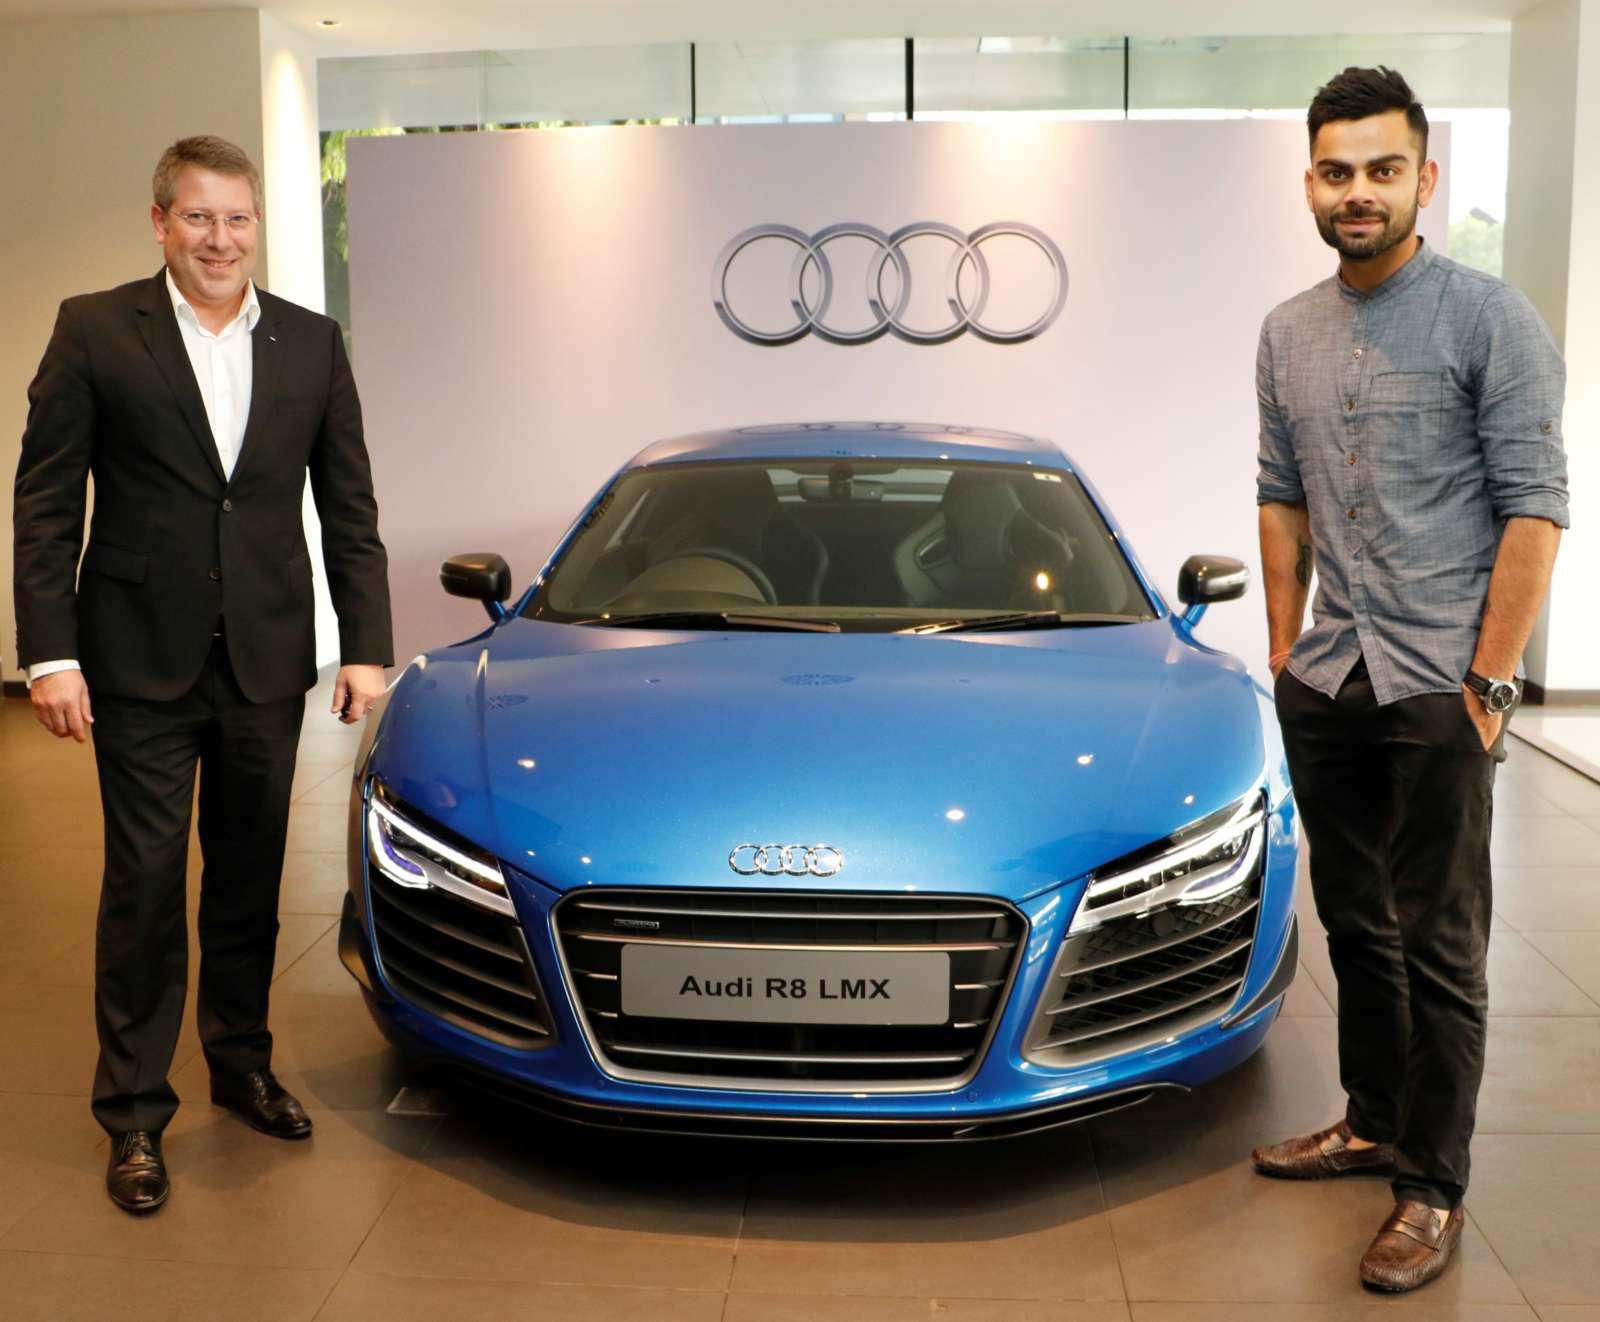 Virat Kohli Gets Himself An Audi R8 Lmx 1 Of 99 Ever Made